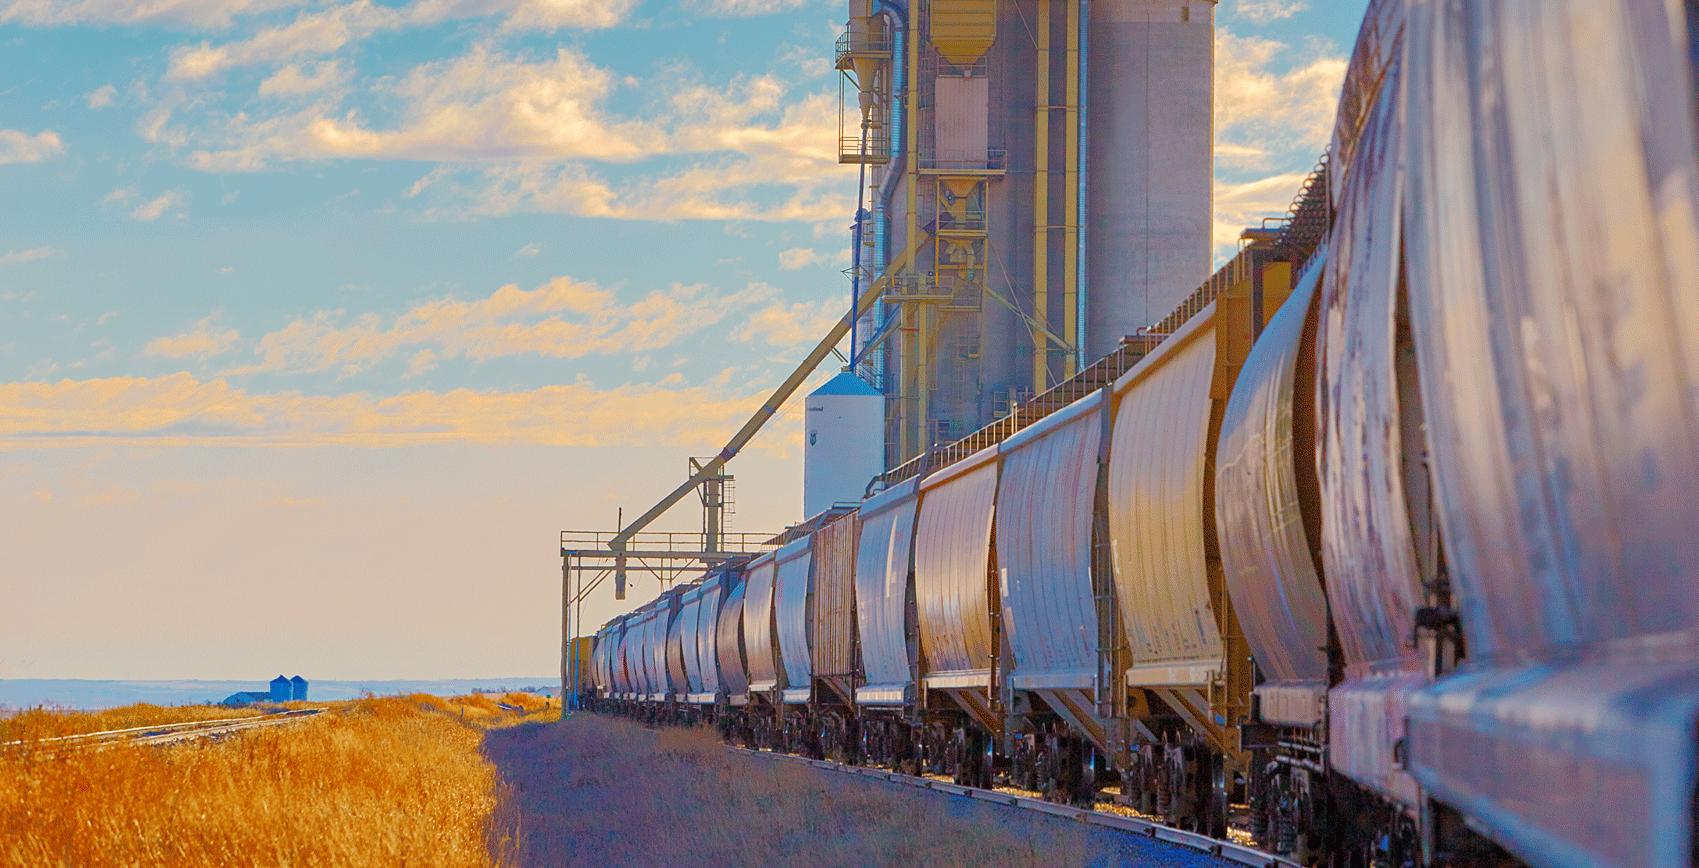 CSX train on a track.